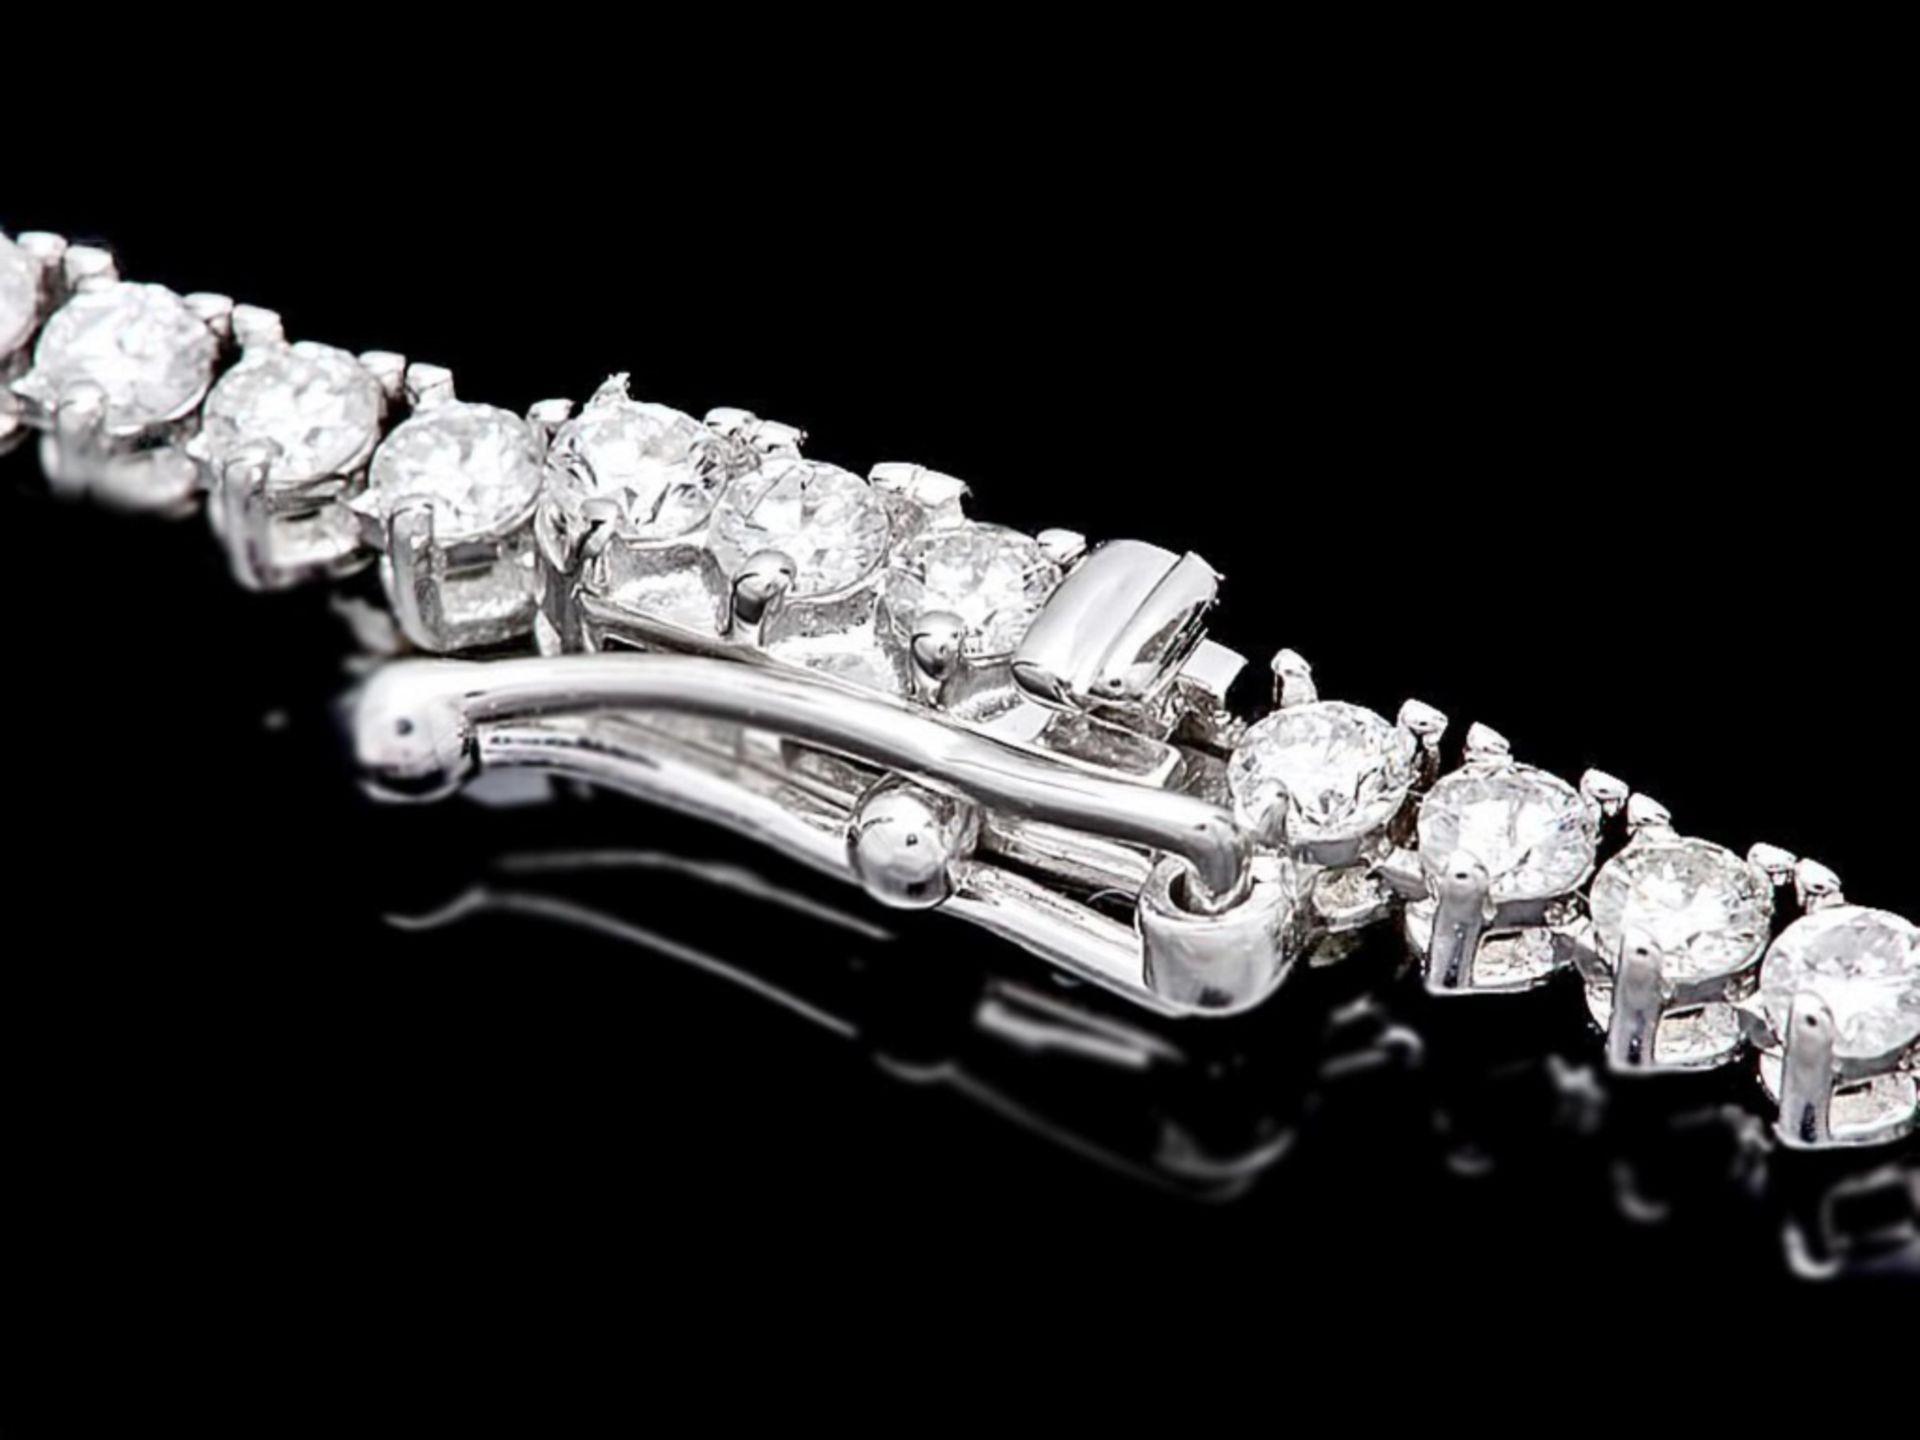 ^18k White Gold 6.00ct Diamond Necklace - Image 2 of 3